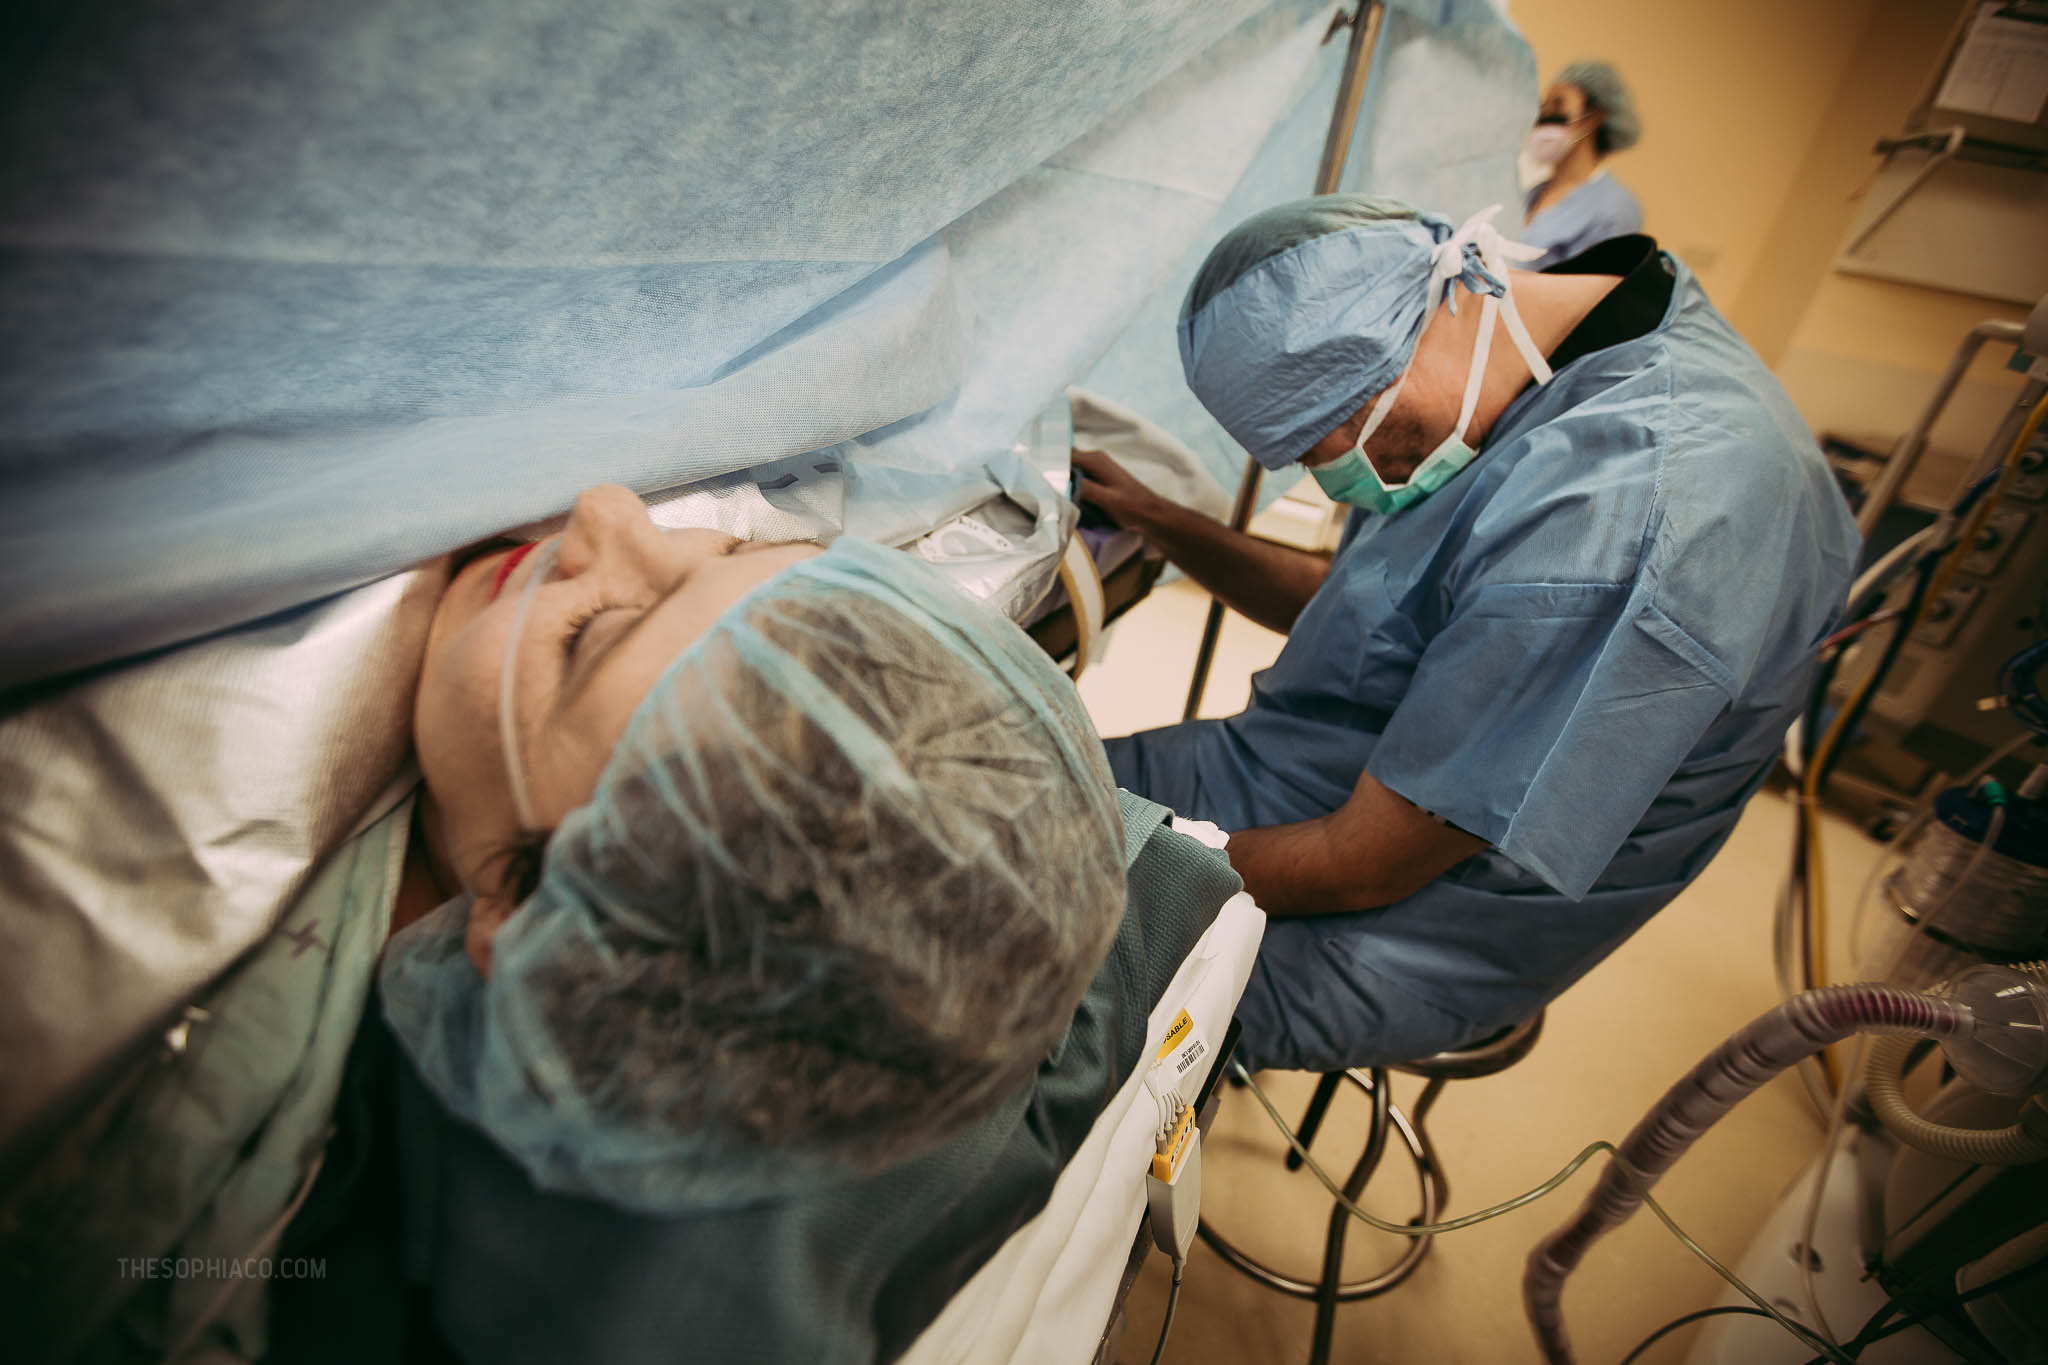 Oahu-Birth-Photographer-scheduled-cesarean-kaiser-13.jpg